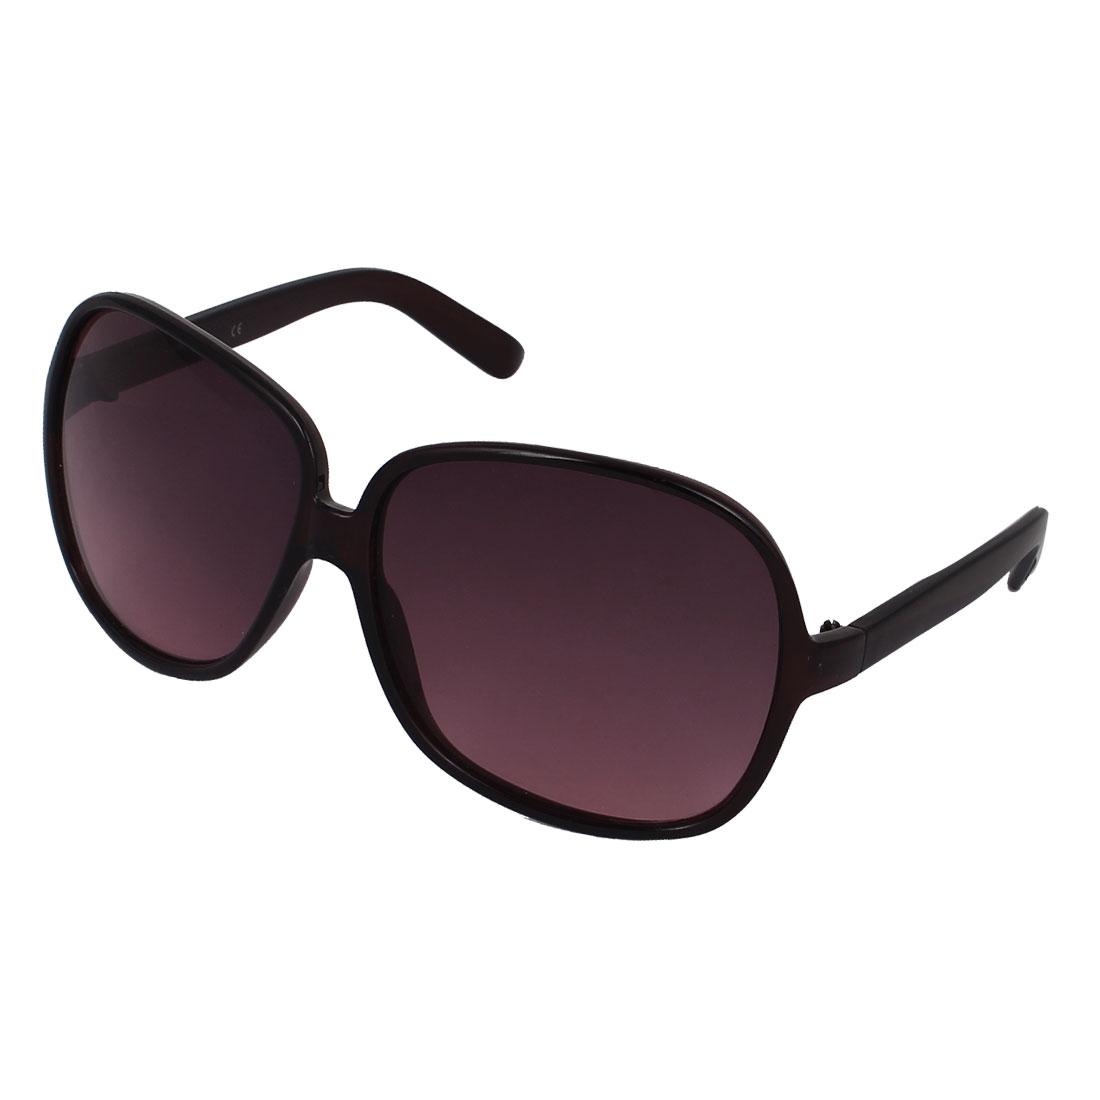 Women Plastic Full Frame Single Bridge Gradient Tear Drop Lens Sunglasses Black